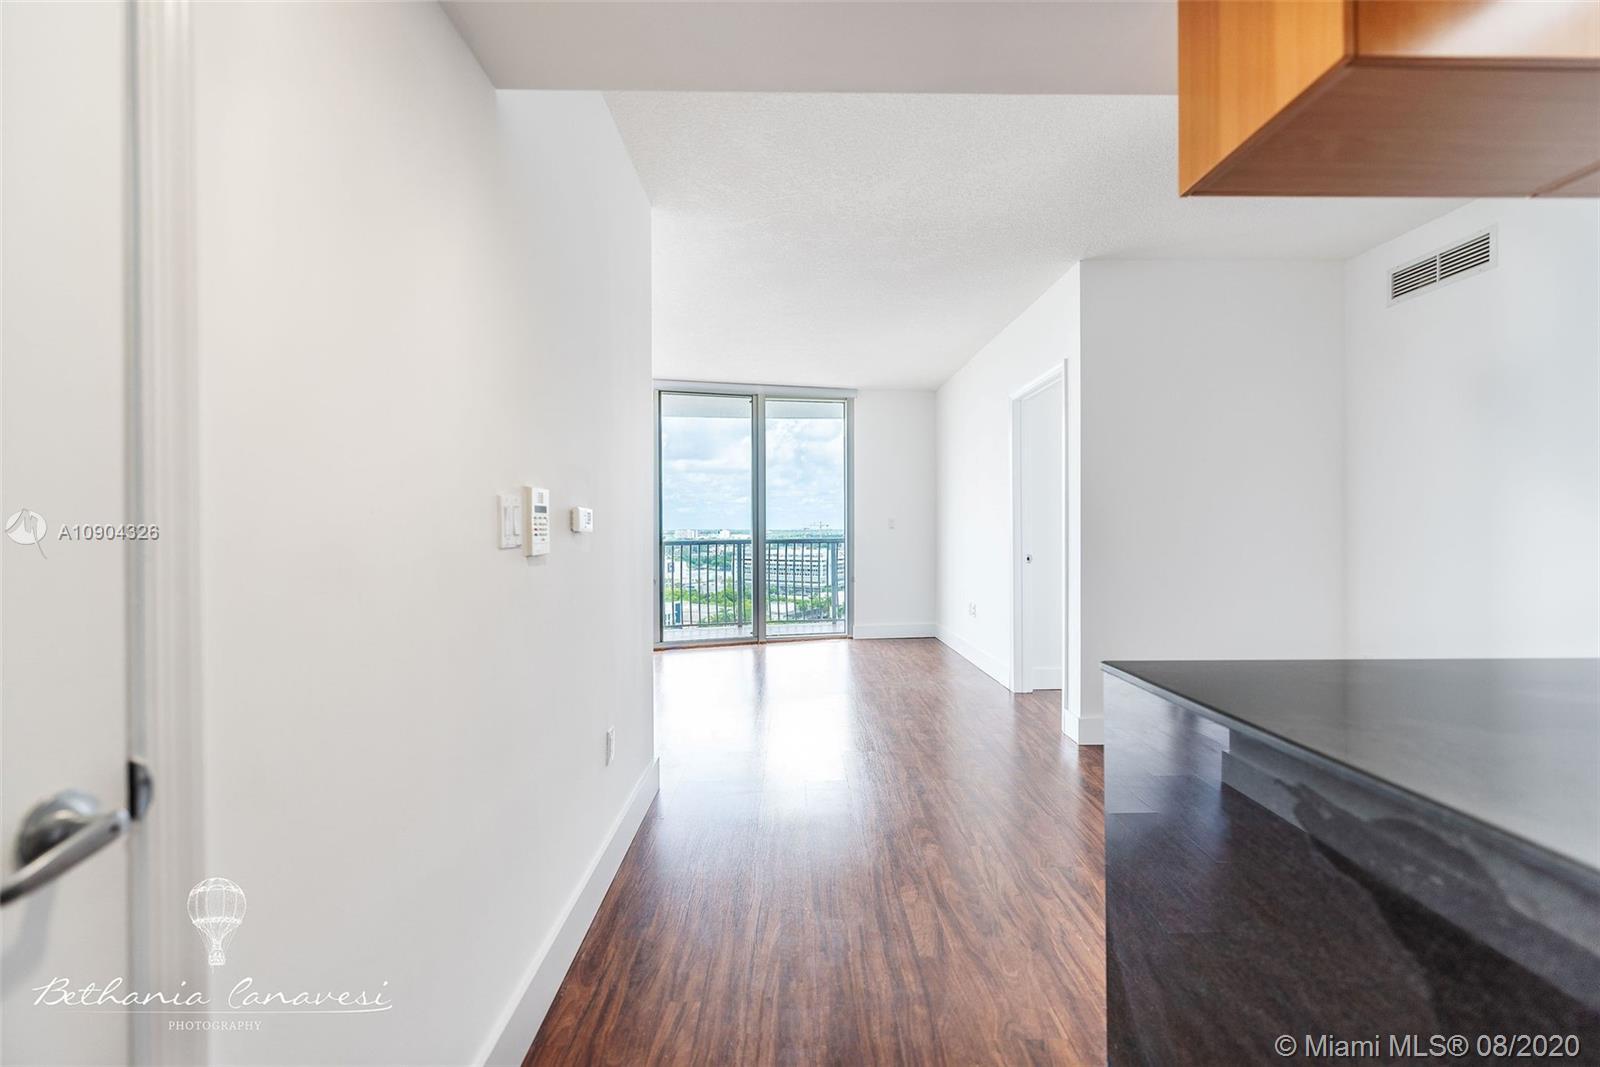 1750 N Bayshore Dr # 1915, Miami, Florida 33132, 2 Bedrooms Bedrooms, ,2 BathroomsBathrooms,Residential,For Sale,1750 N Bayshore Dr # 1915,A10904326